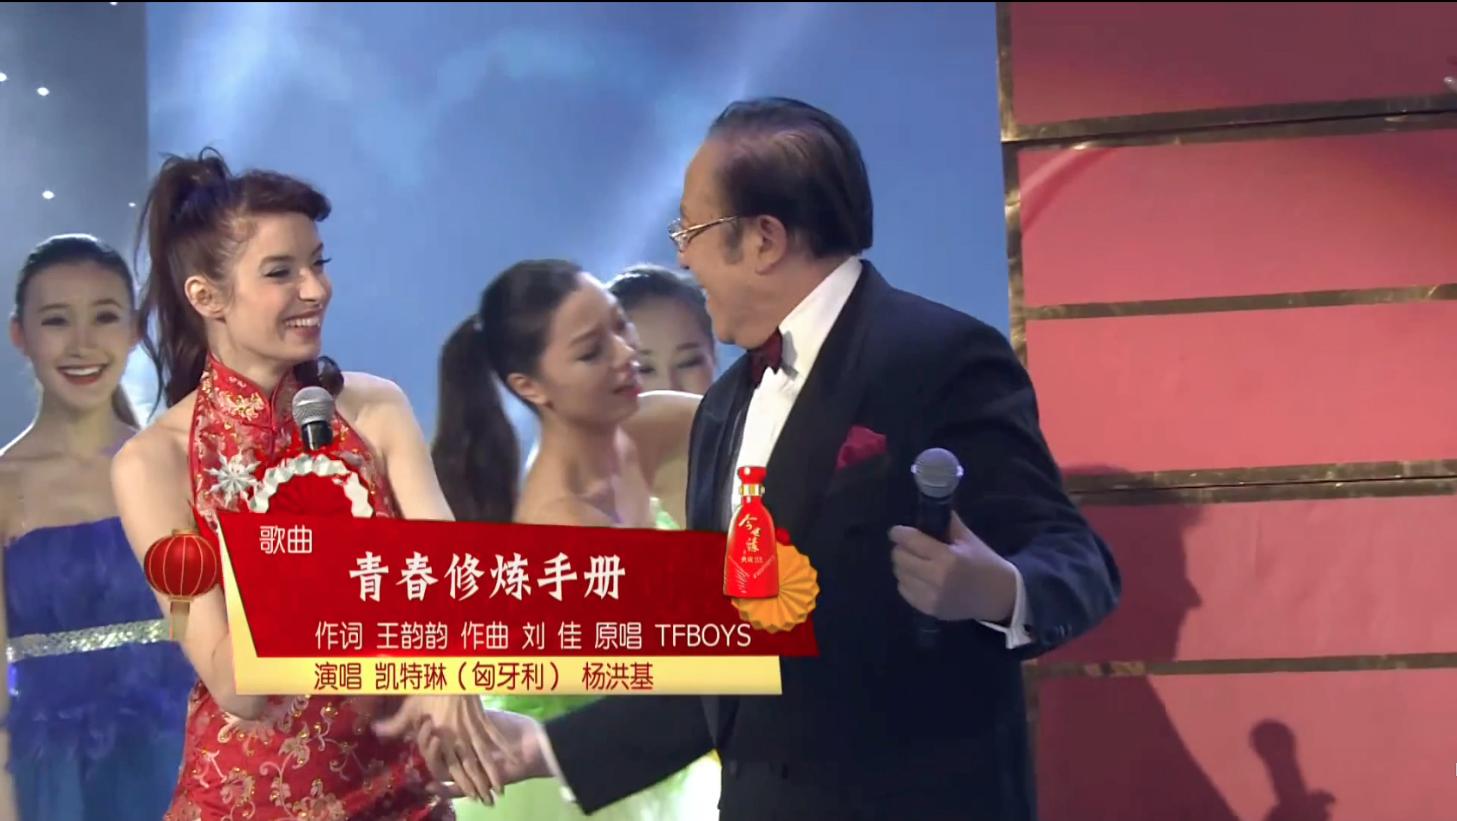 Nice to see you Mr Yang